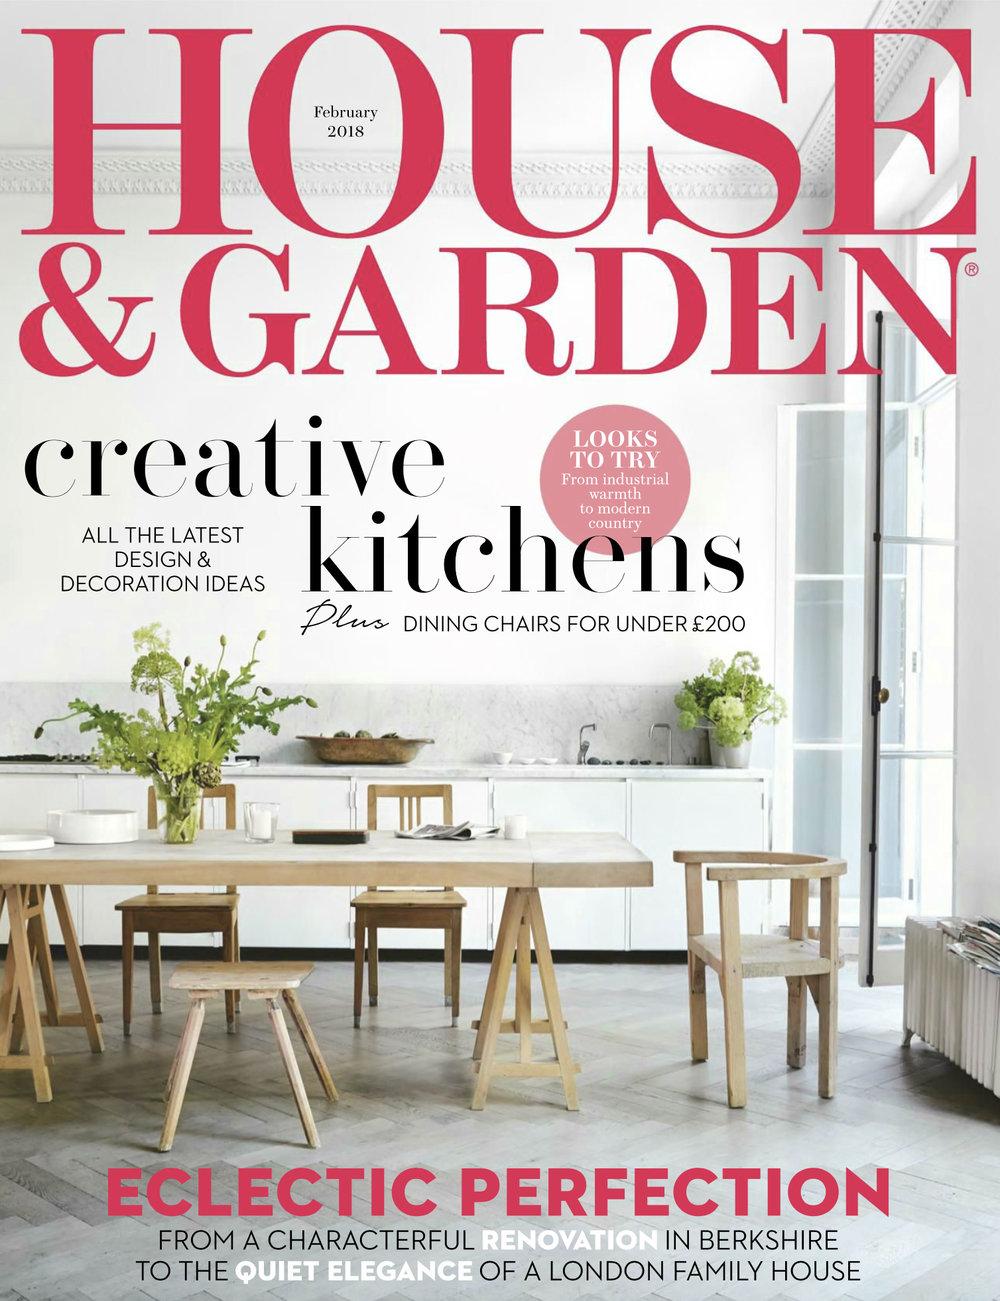 House & Garden front cover.jpg